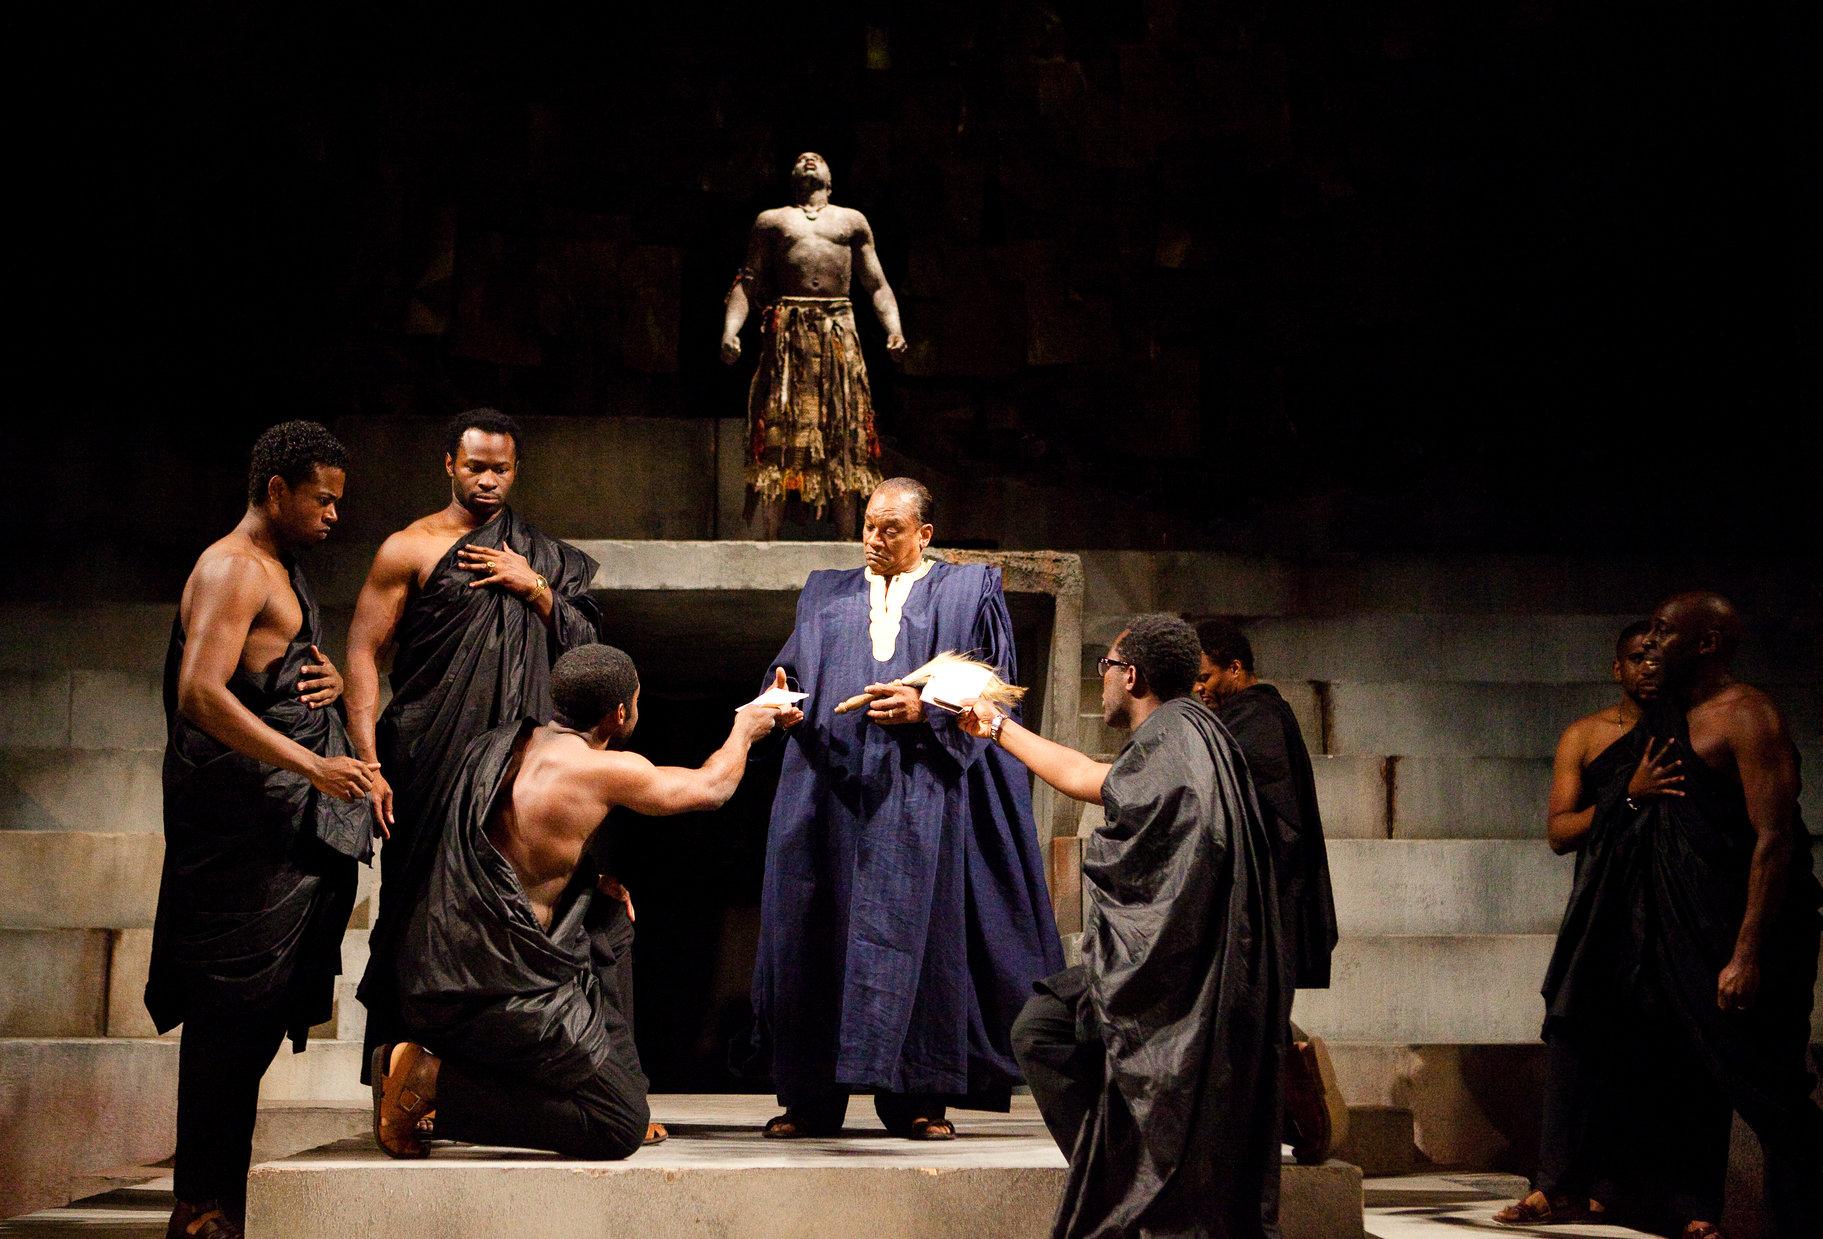 Julius Caesar _2012_Kwame Lestrade _c_ RSC_31985